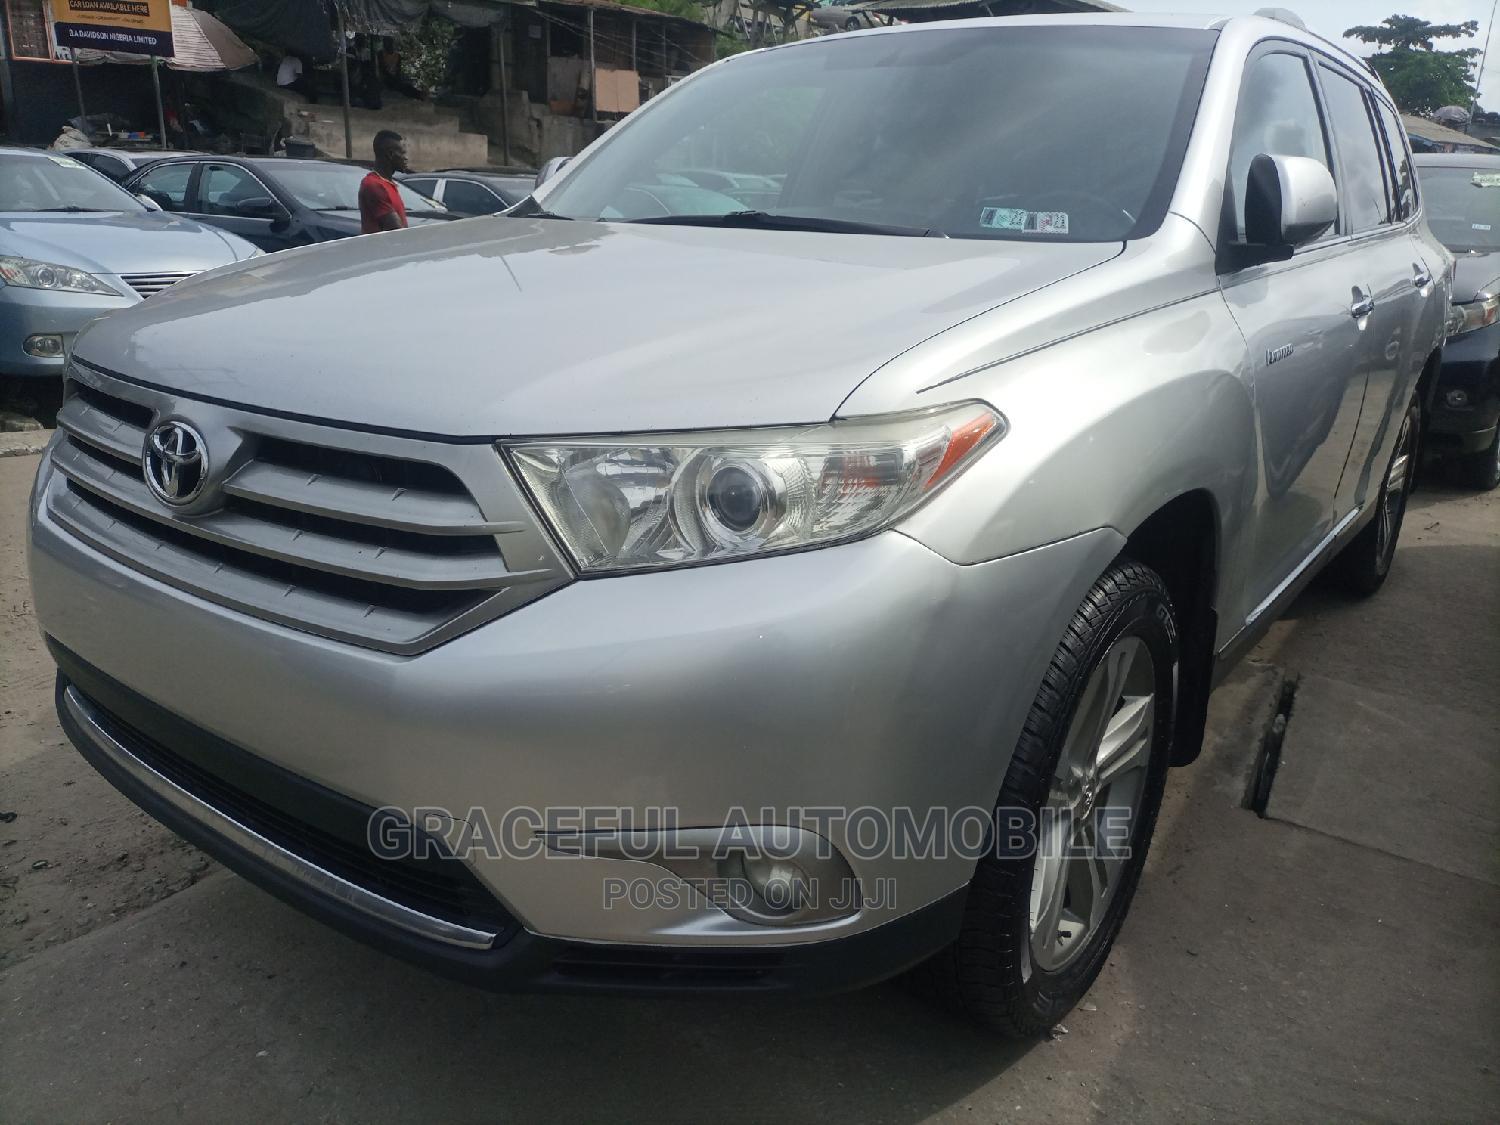 Toyota Highlander 2012 Limited Silver